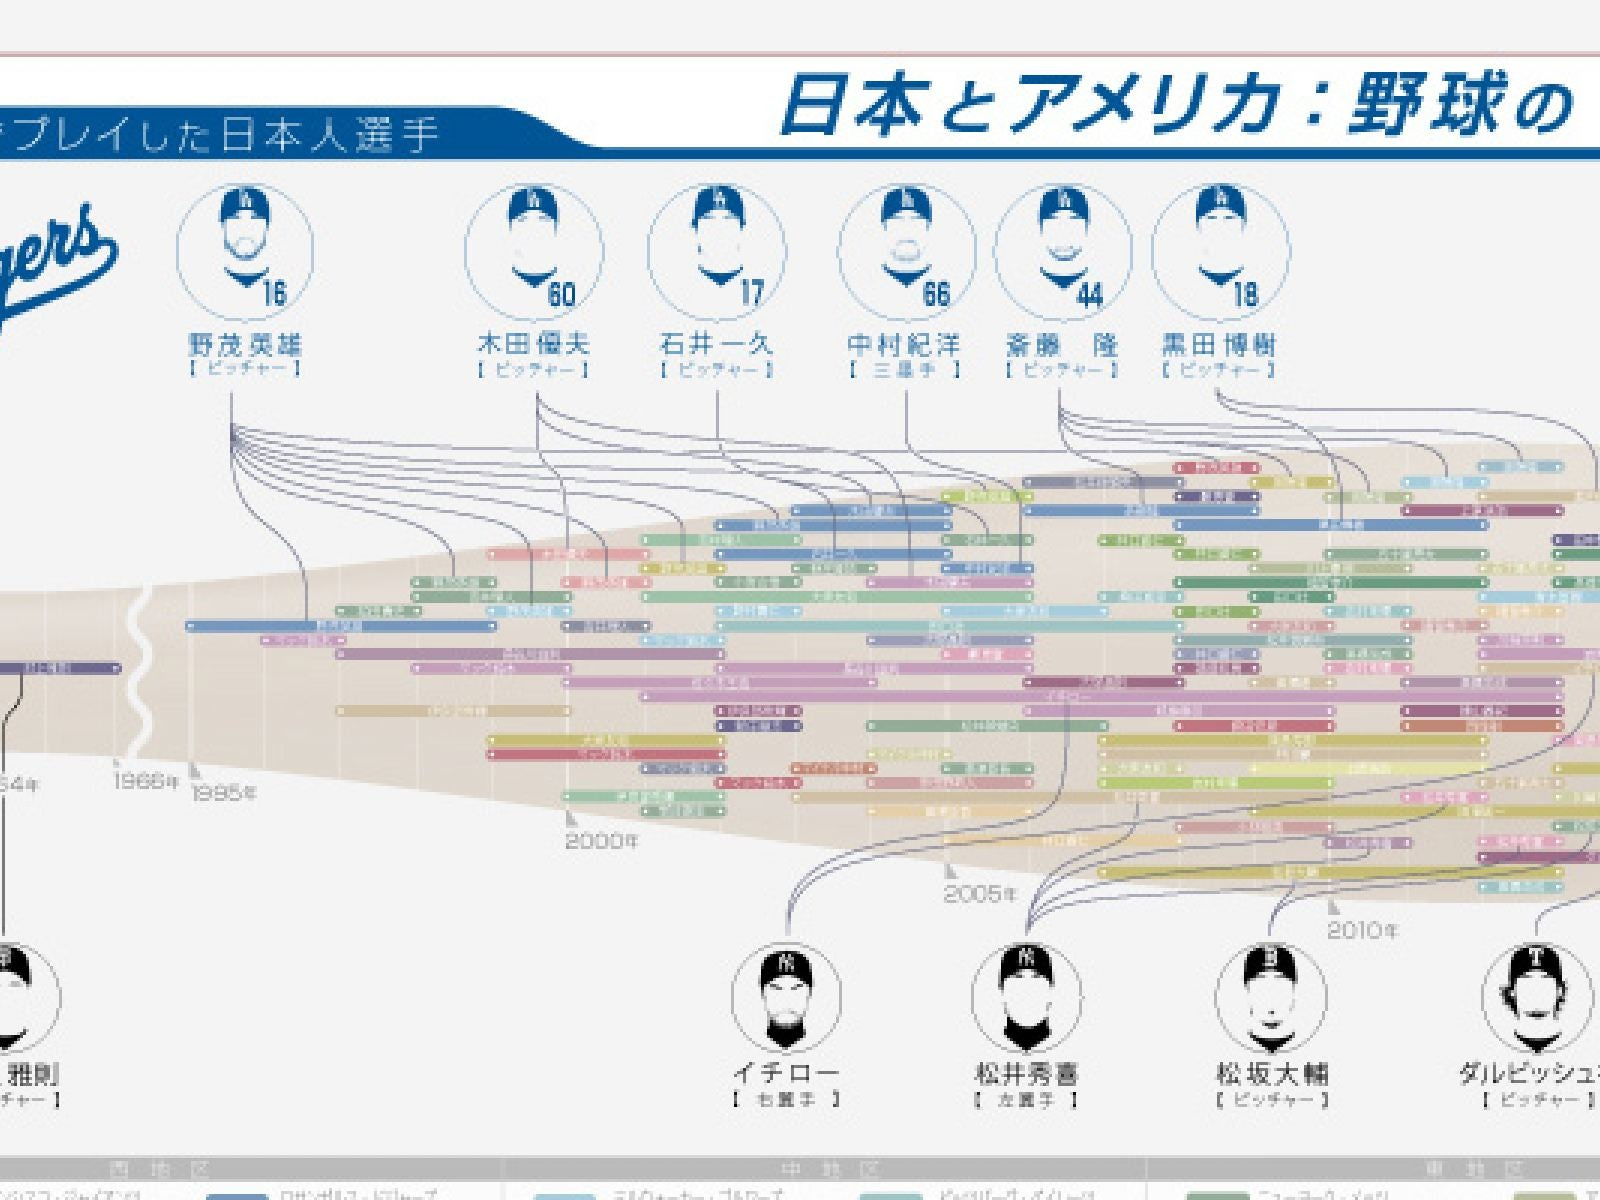 Main image for article titled 【インフォグラフィック】一目で分かるMLBの日本人プレイヤー!